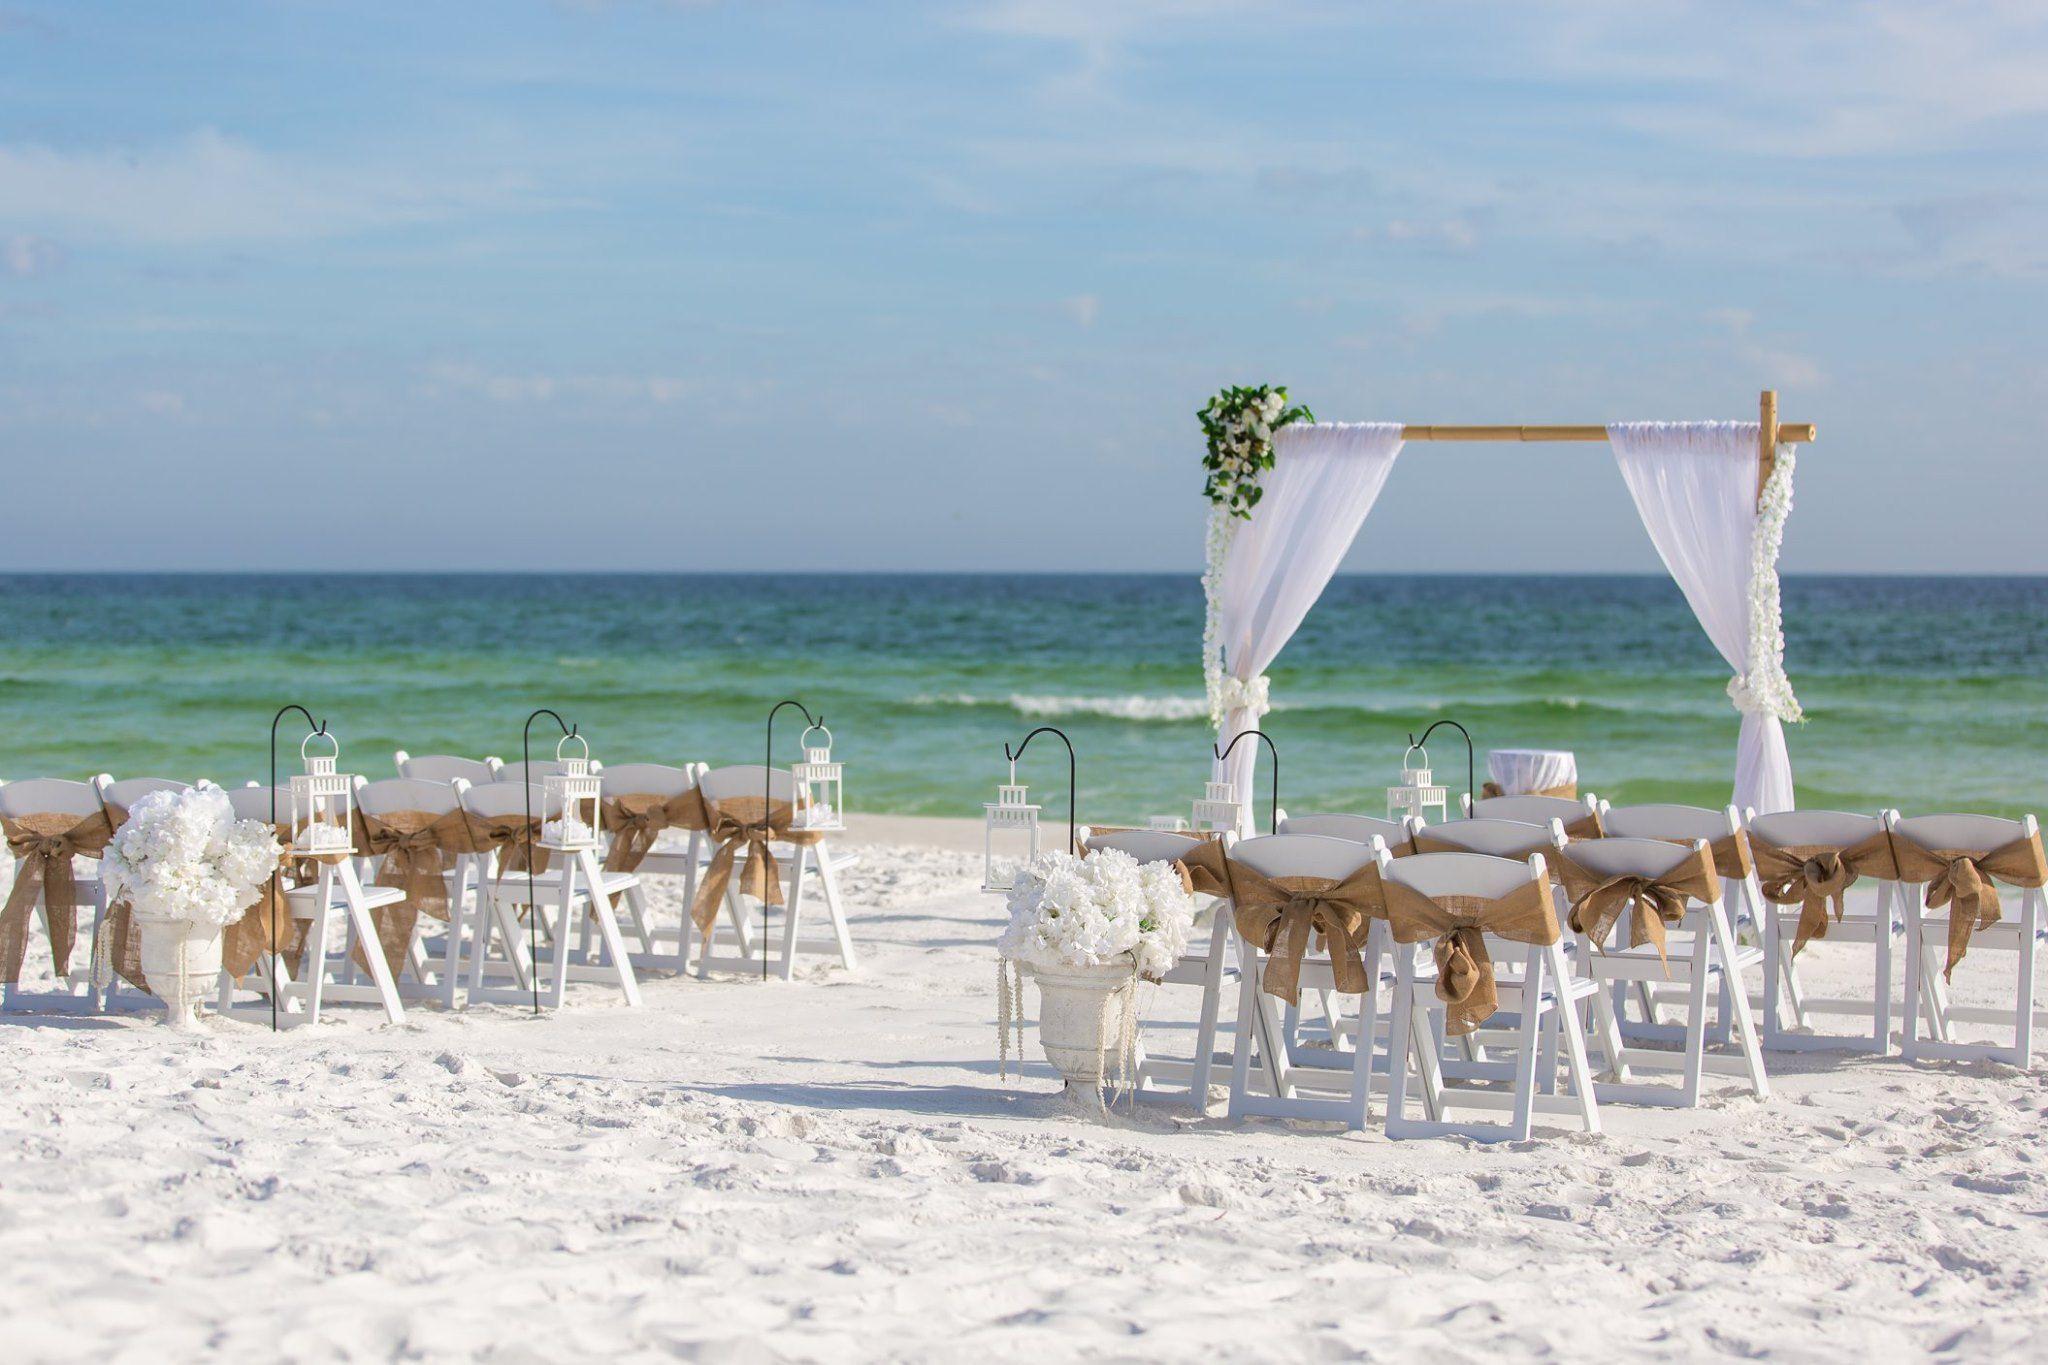 Panama City Beach Wedding In 2020 Panama City Beach Wedding Beach Wedding Beautiful Beach Wedding